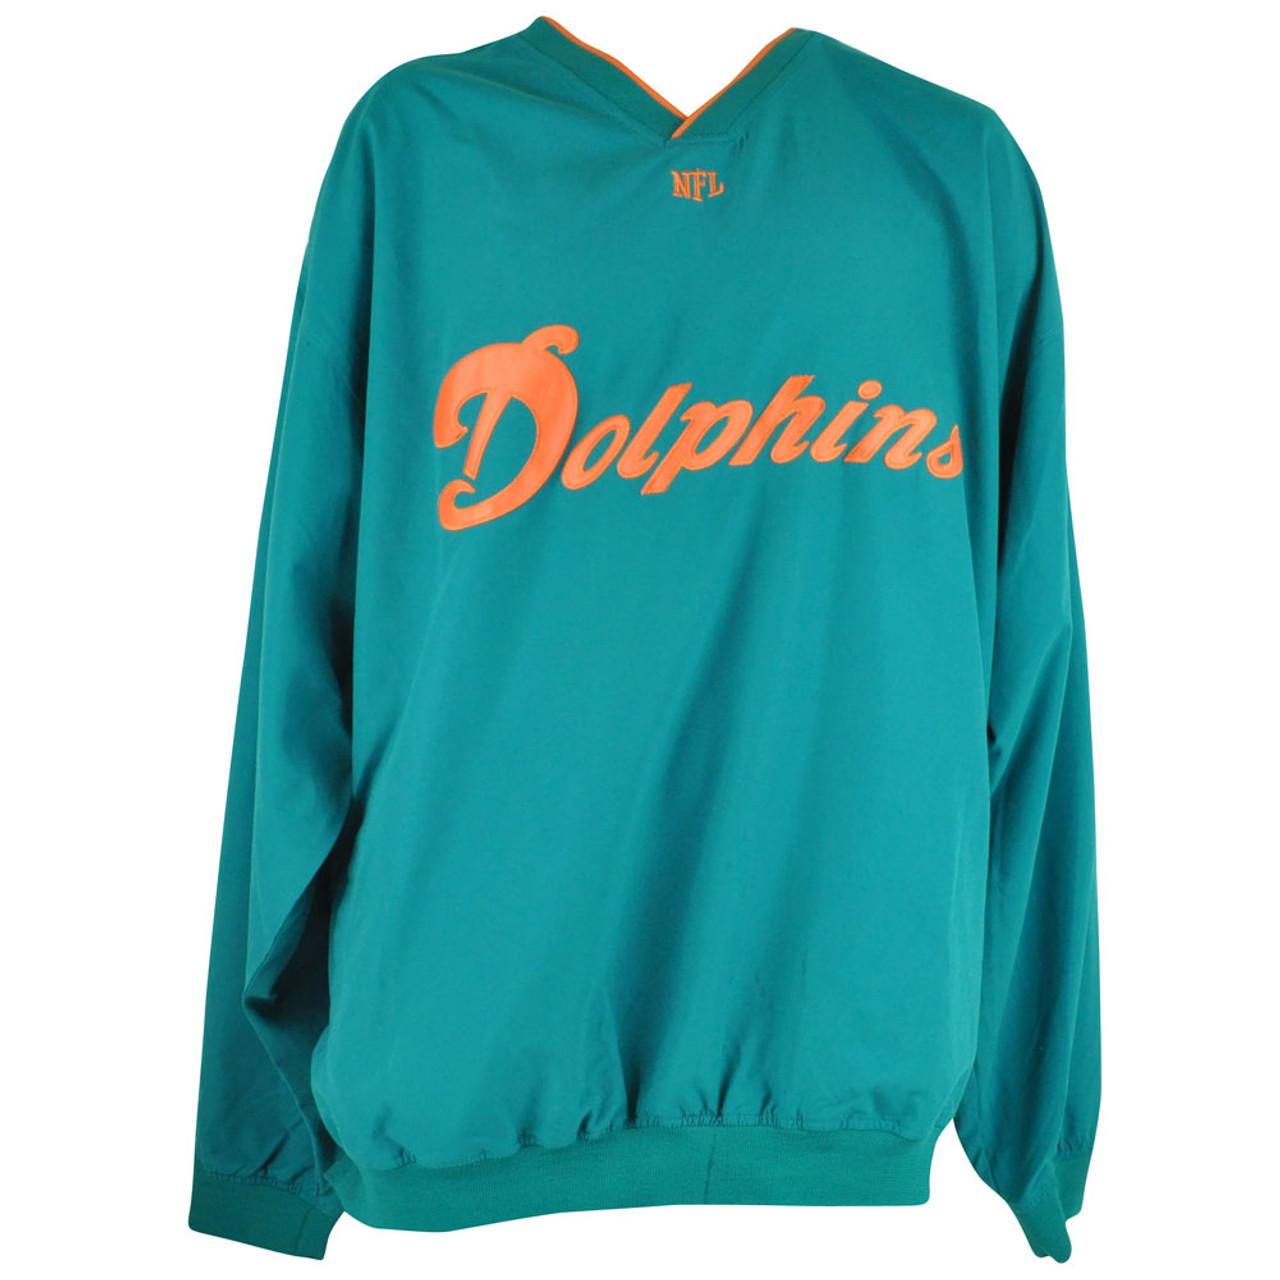 wholesale dealer 1dbea cd948 NFL Miami Dolphins Fins Micro Vneck Jacket Big & Tall Pullover Mens DM5107